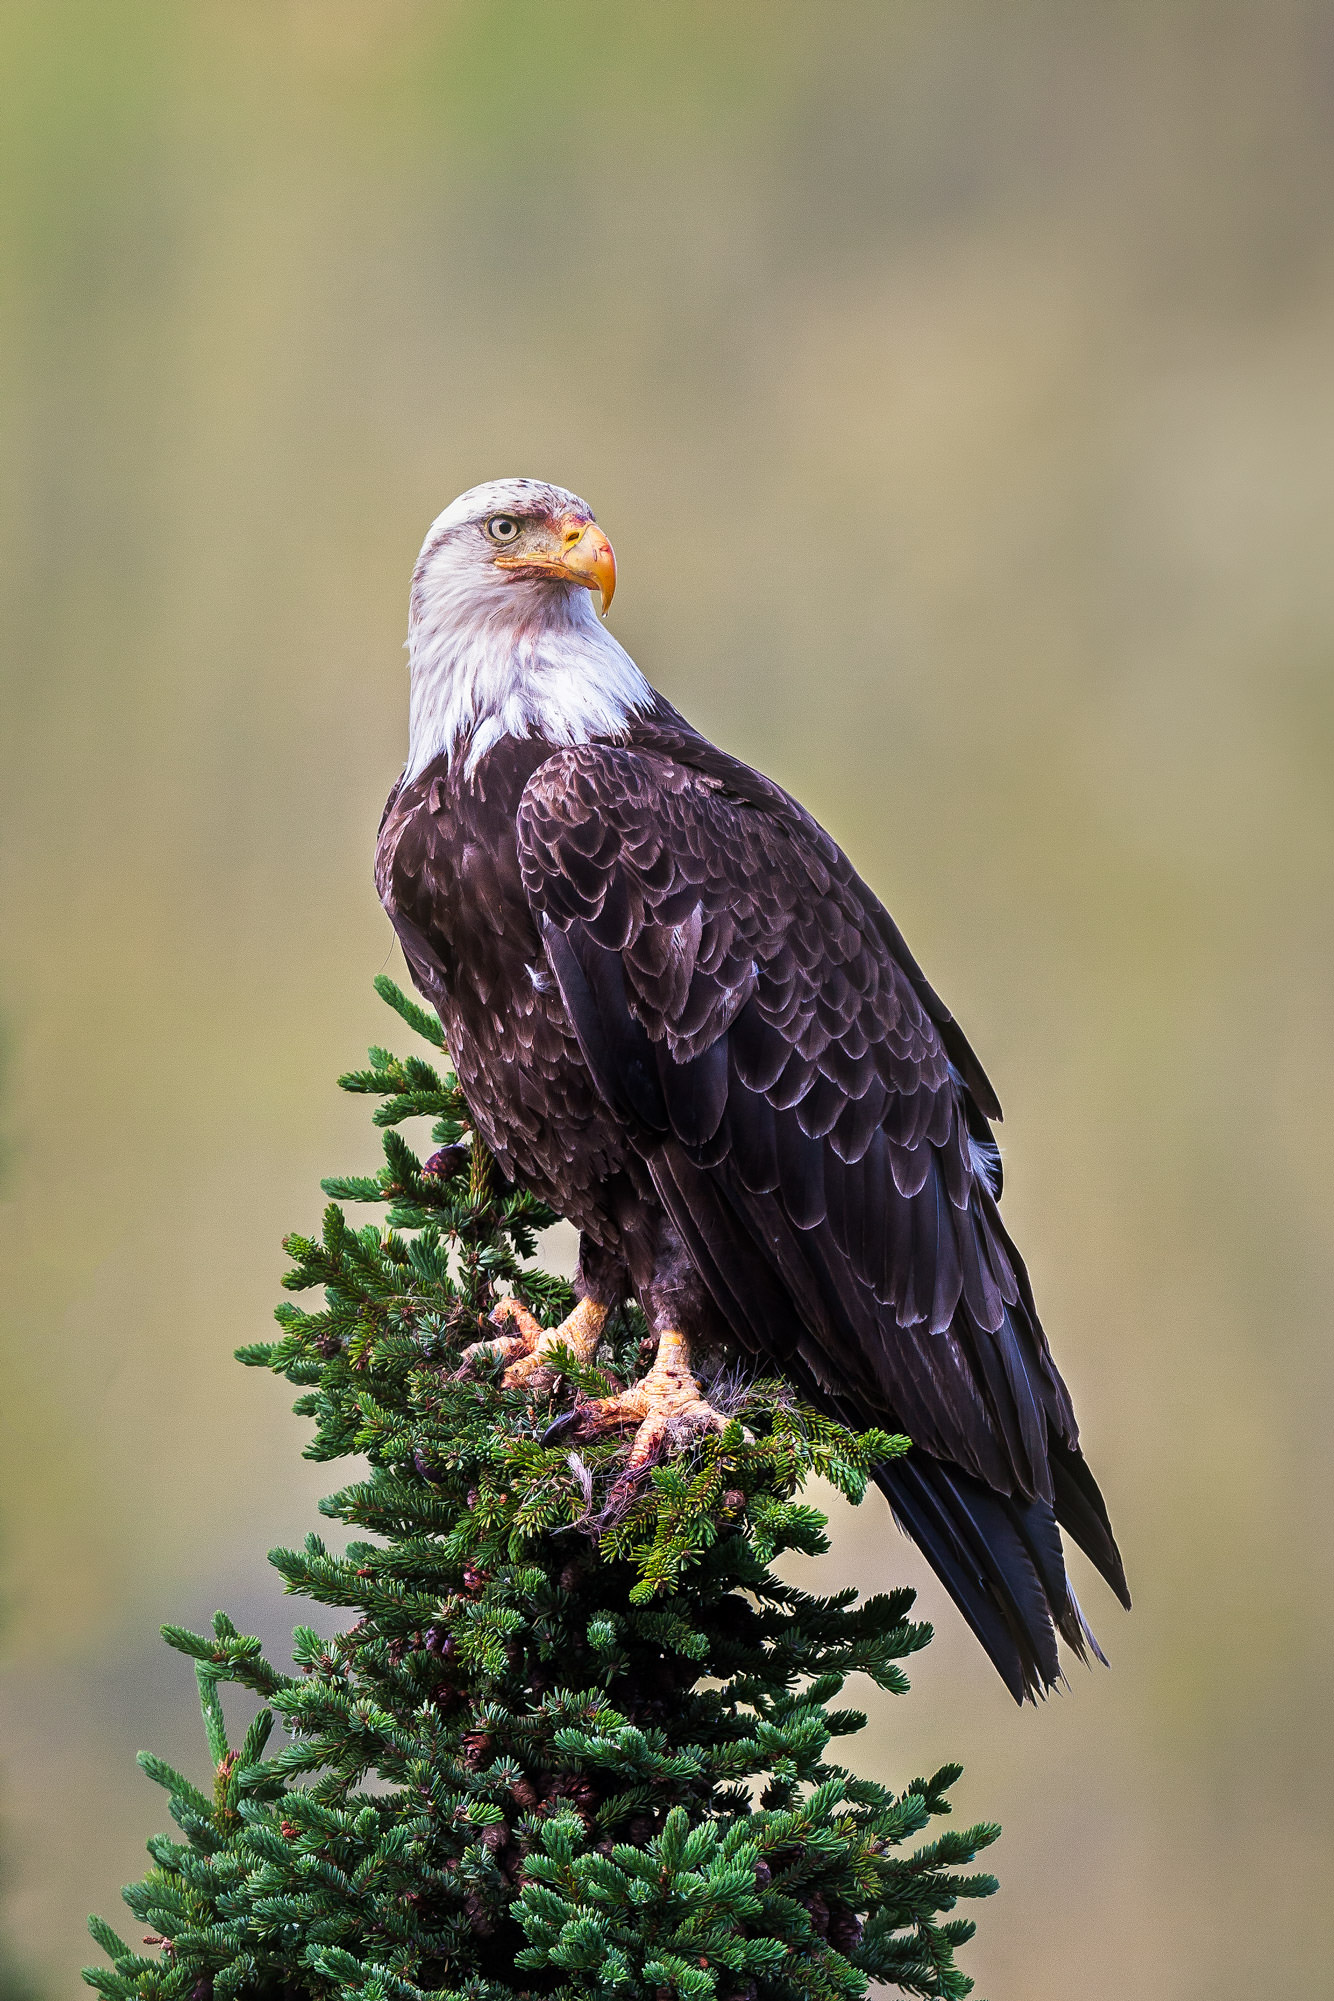 An Eagle S Perch British Columbia Canada Fine Art